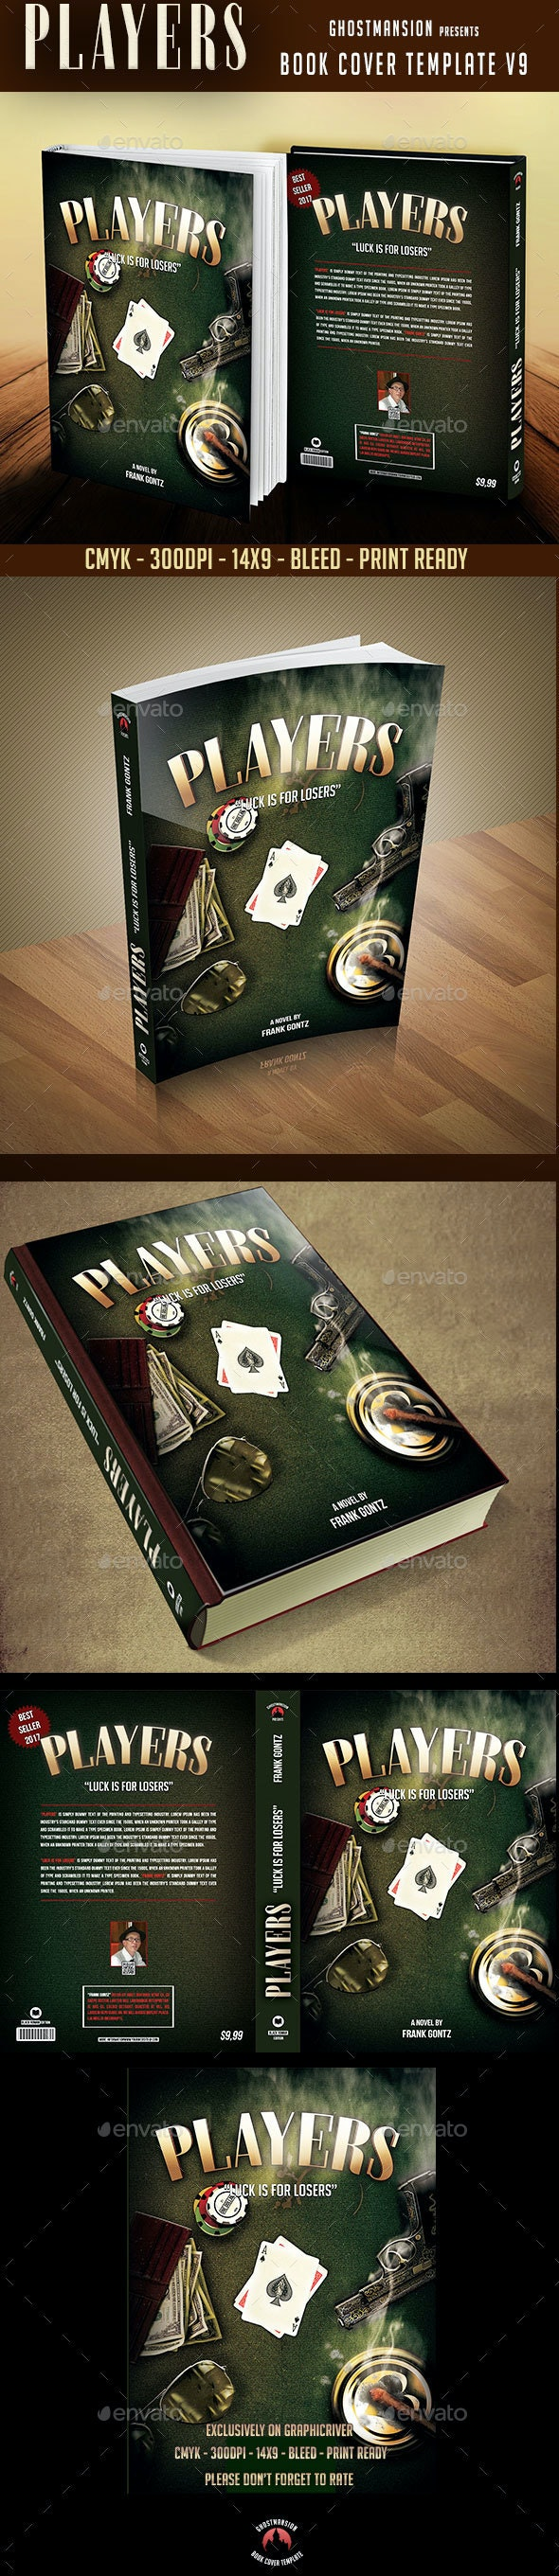 """Player"" Book Cover Template PSD V9 - Print Templates"